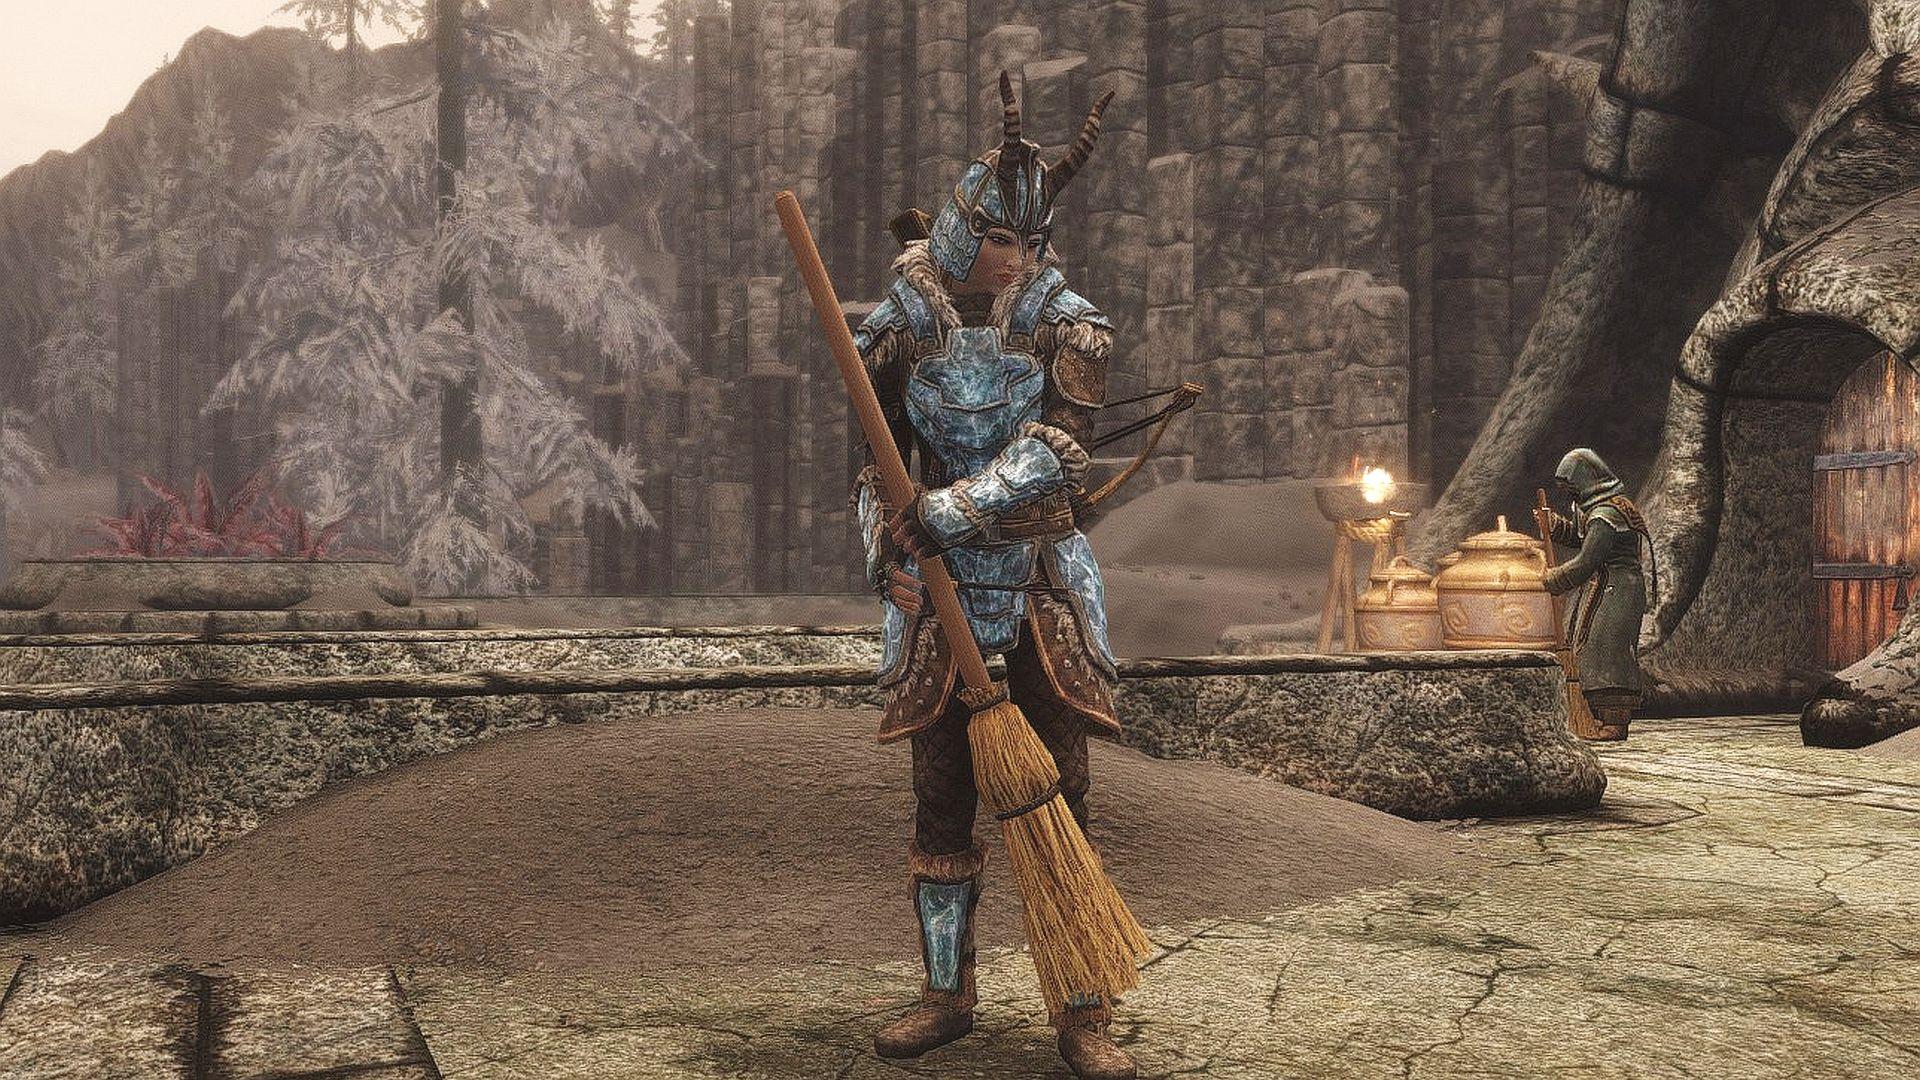 Skyrim sound not working pc | Audio Problem :: The Elder Scrolls V